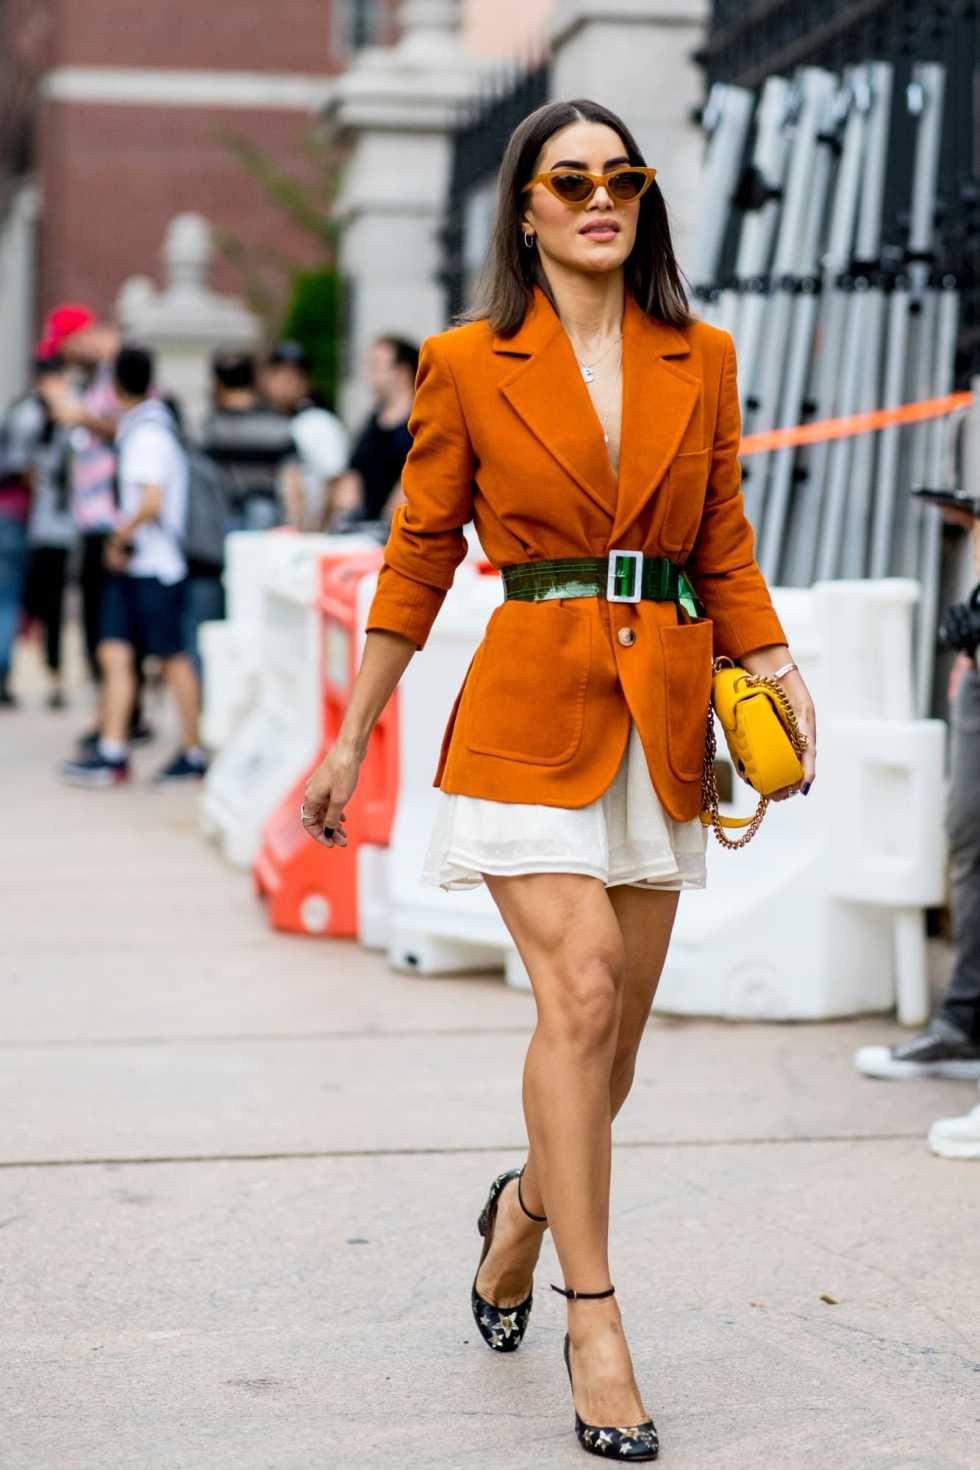 new-york-fashion-week-street-style-spring-2019-day-2-32